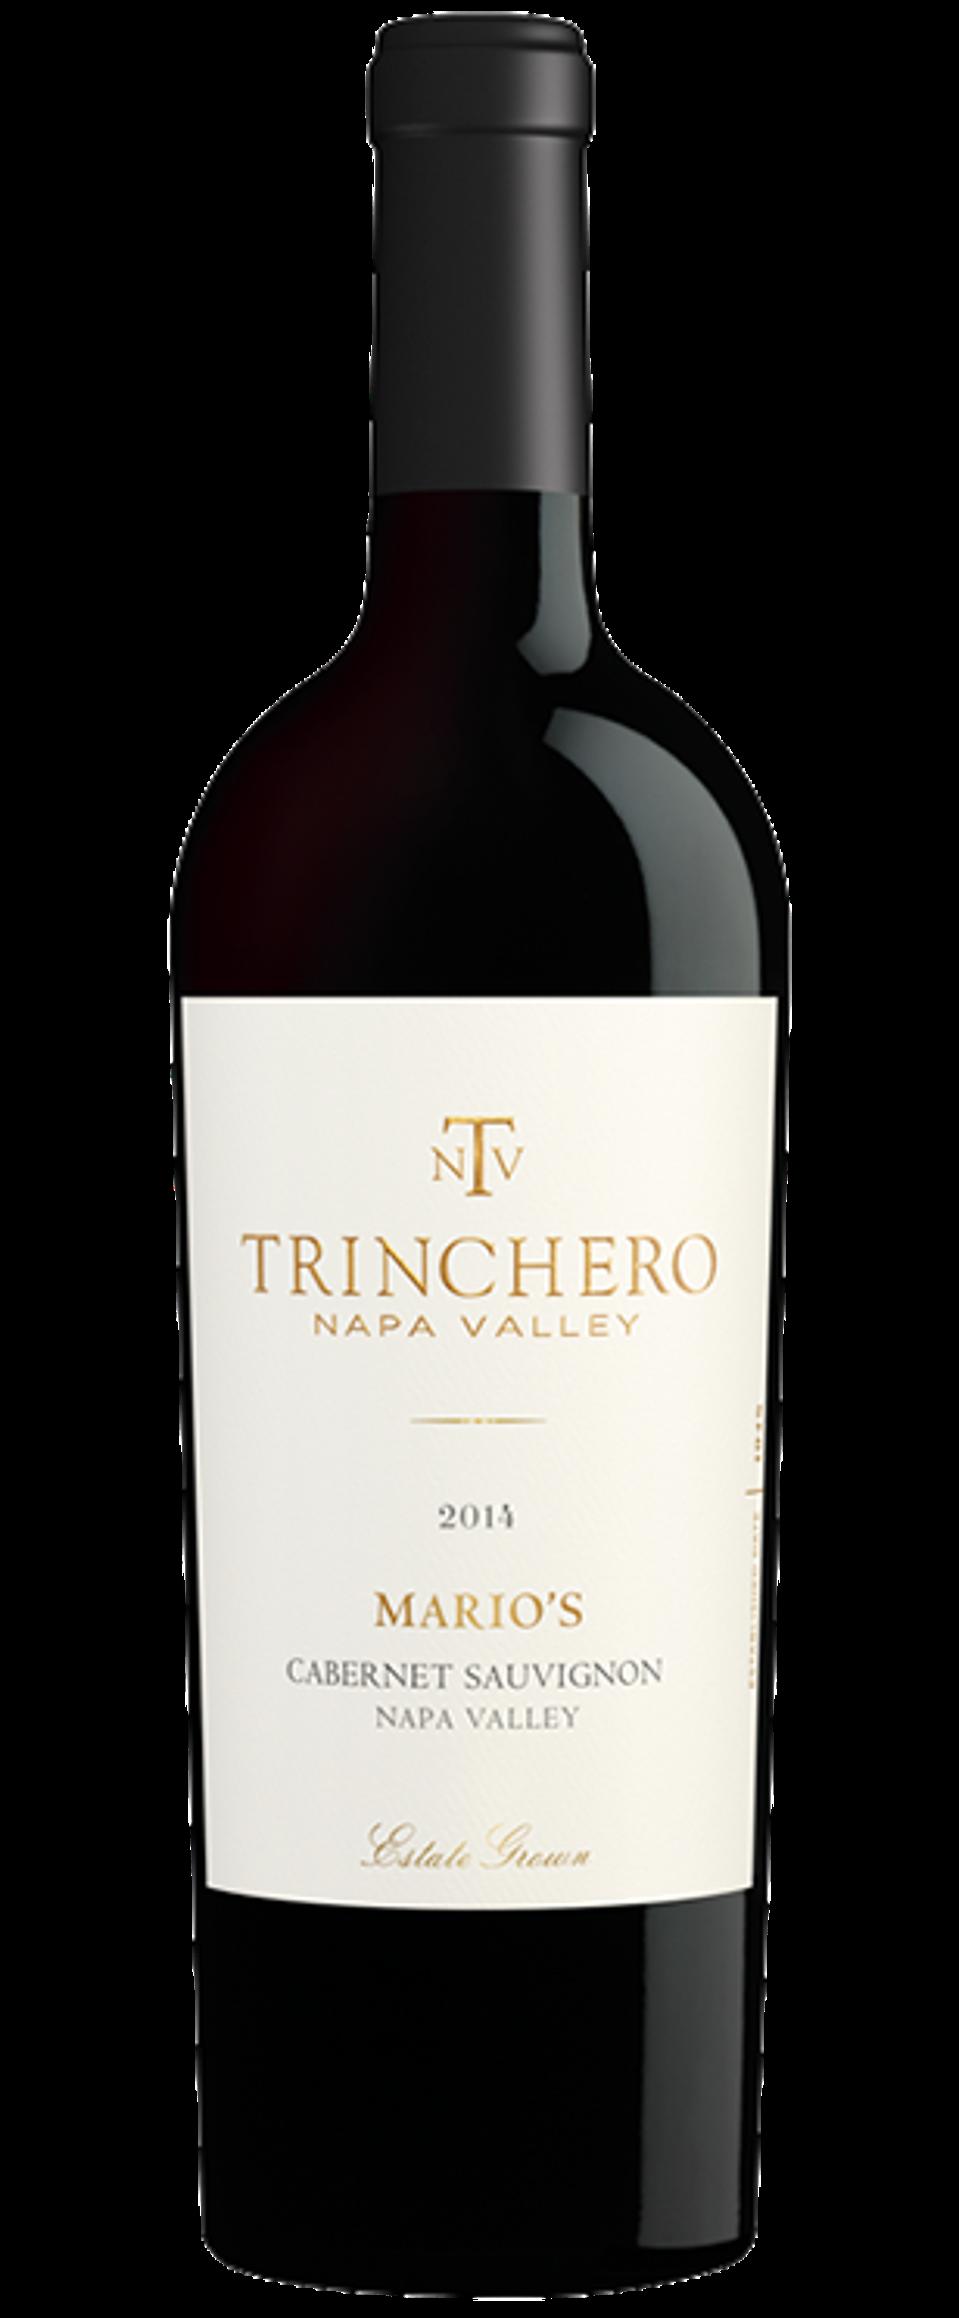 Mario's Cabernet Sauvignon From Trinchero Napa Valley